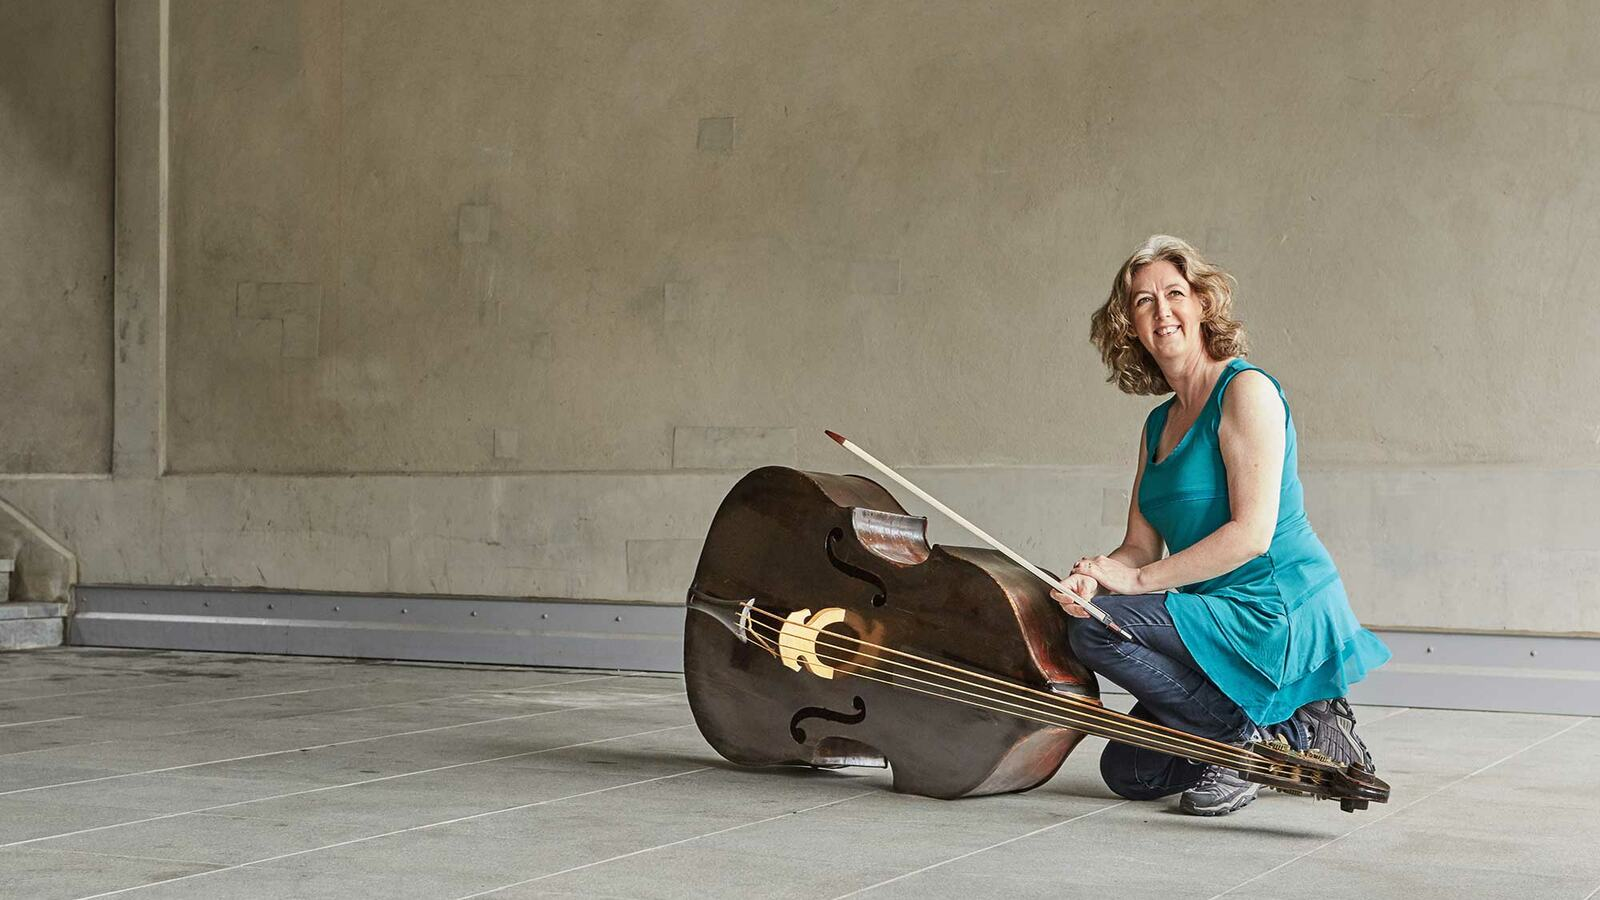 Cecelia Bruggemeyer, double bass